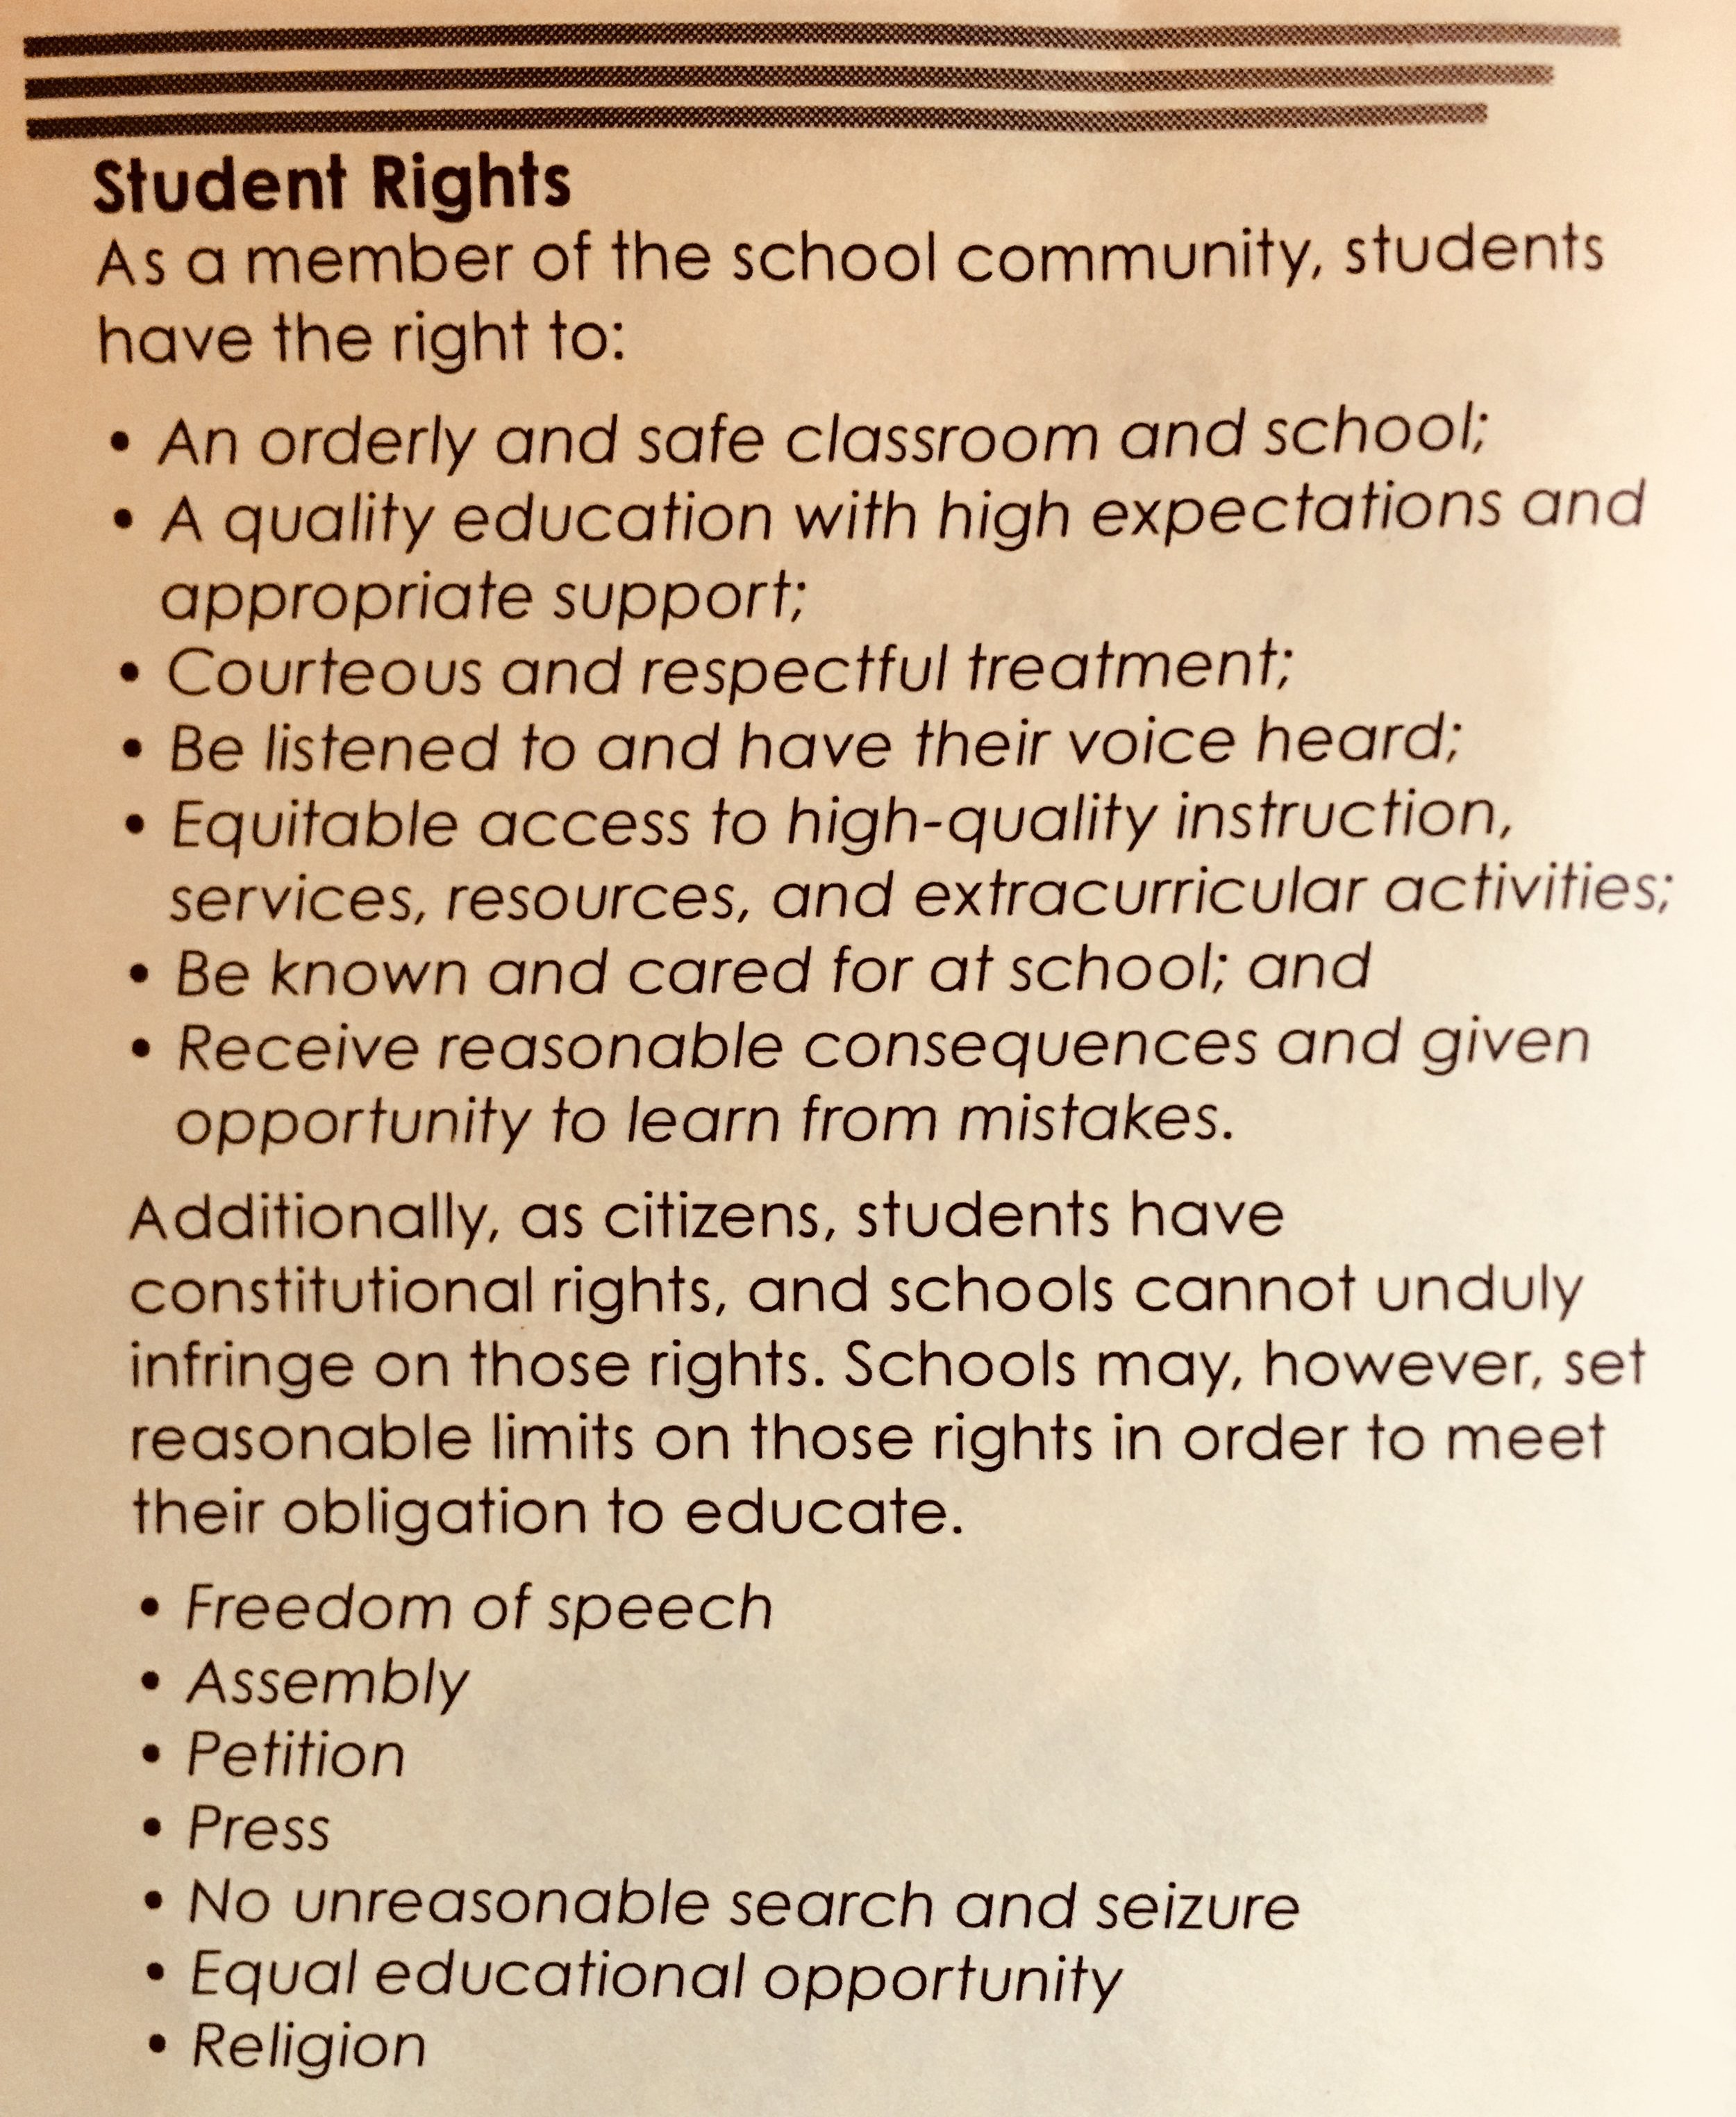 Student Rights.jpg